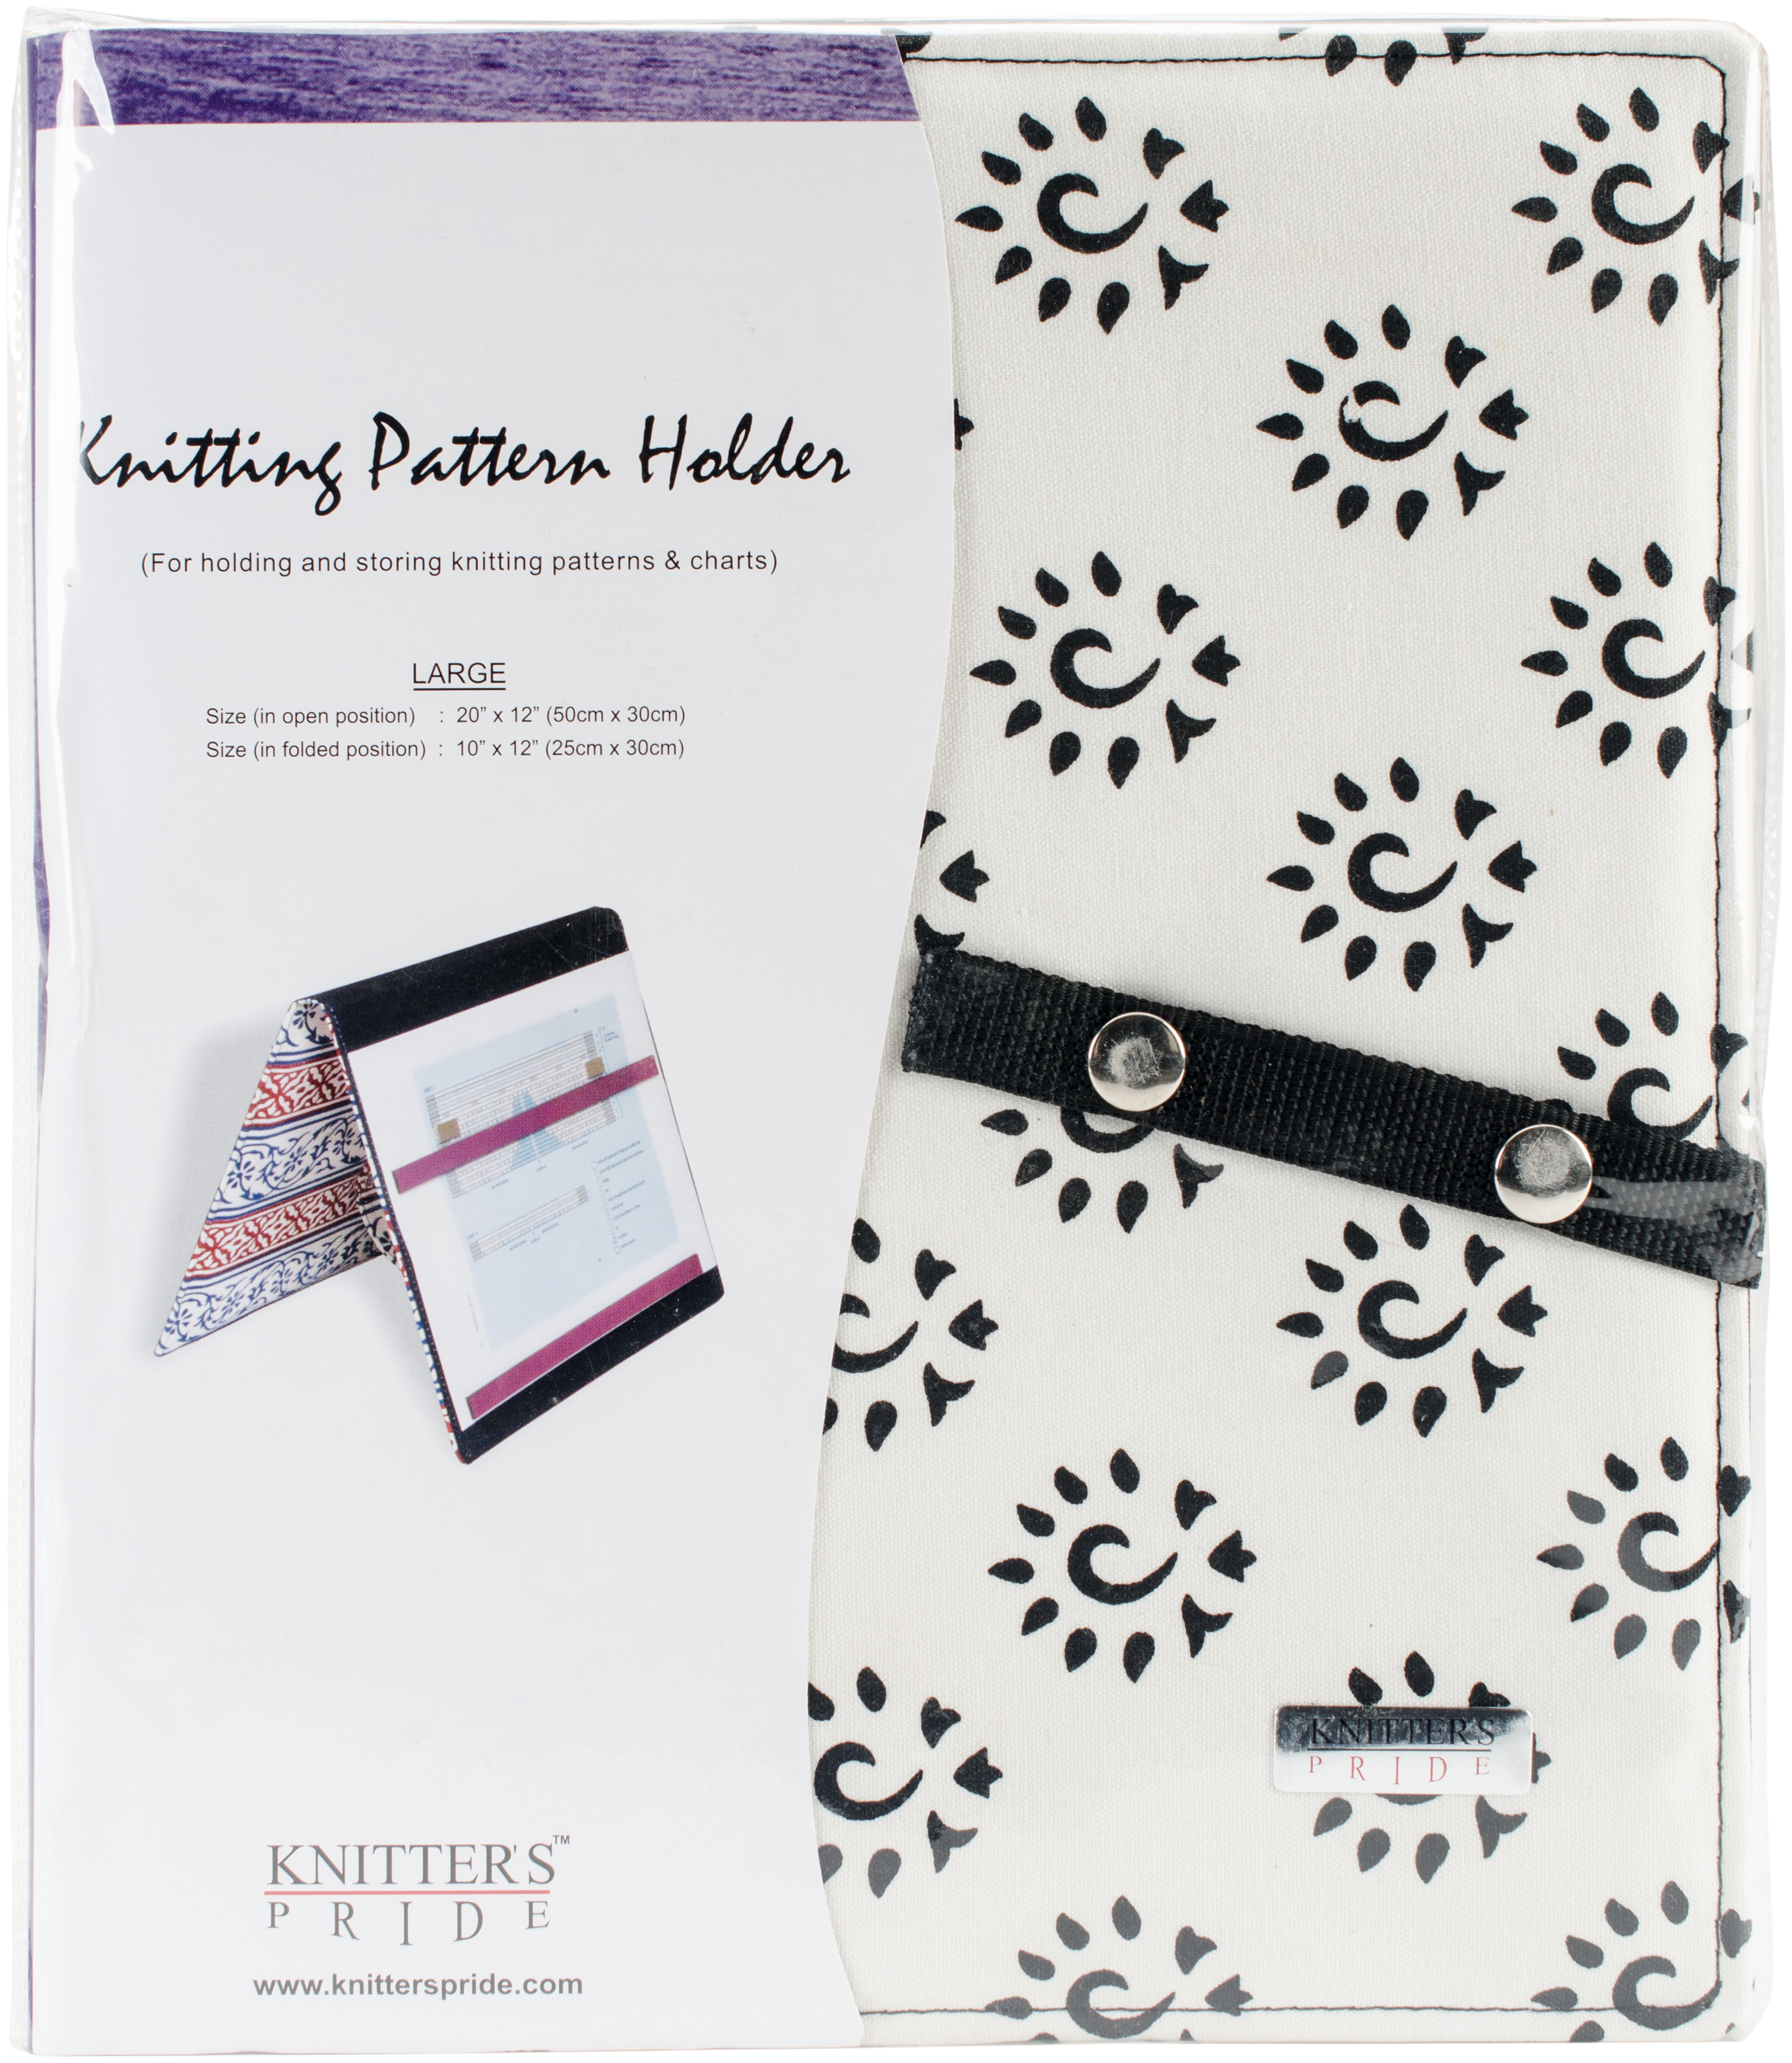 Knitter's Pride Pattern Holder Large - Amber Black